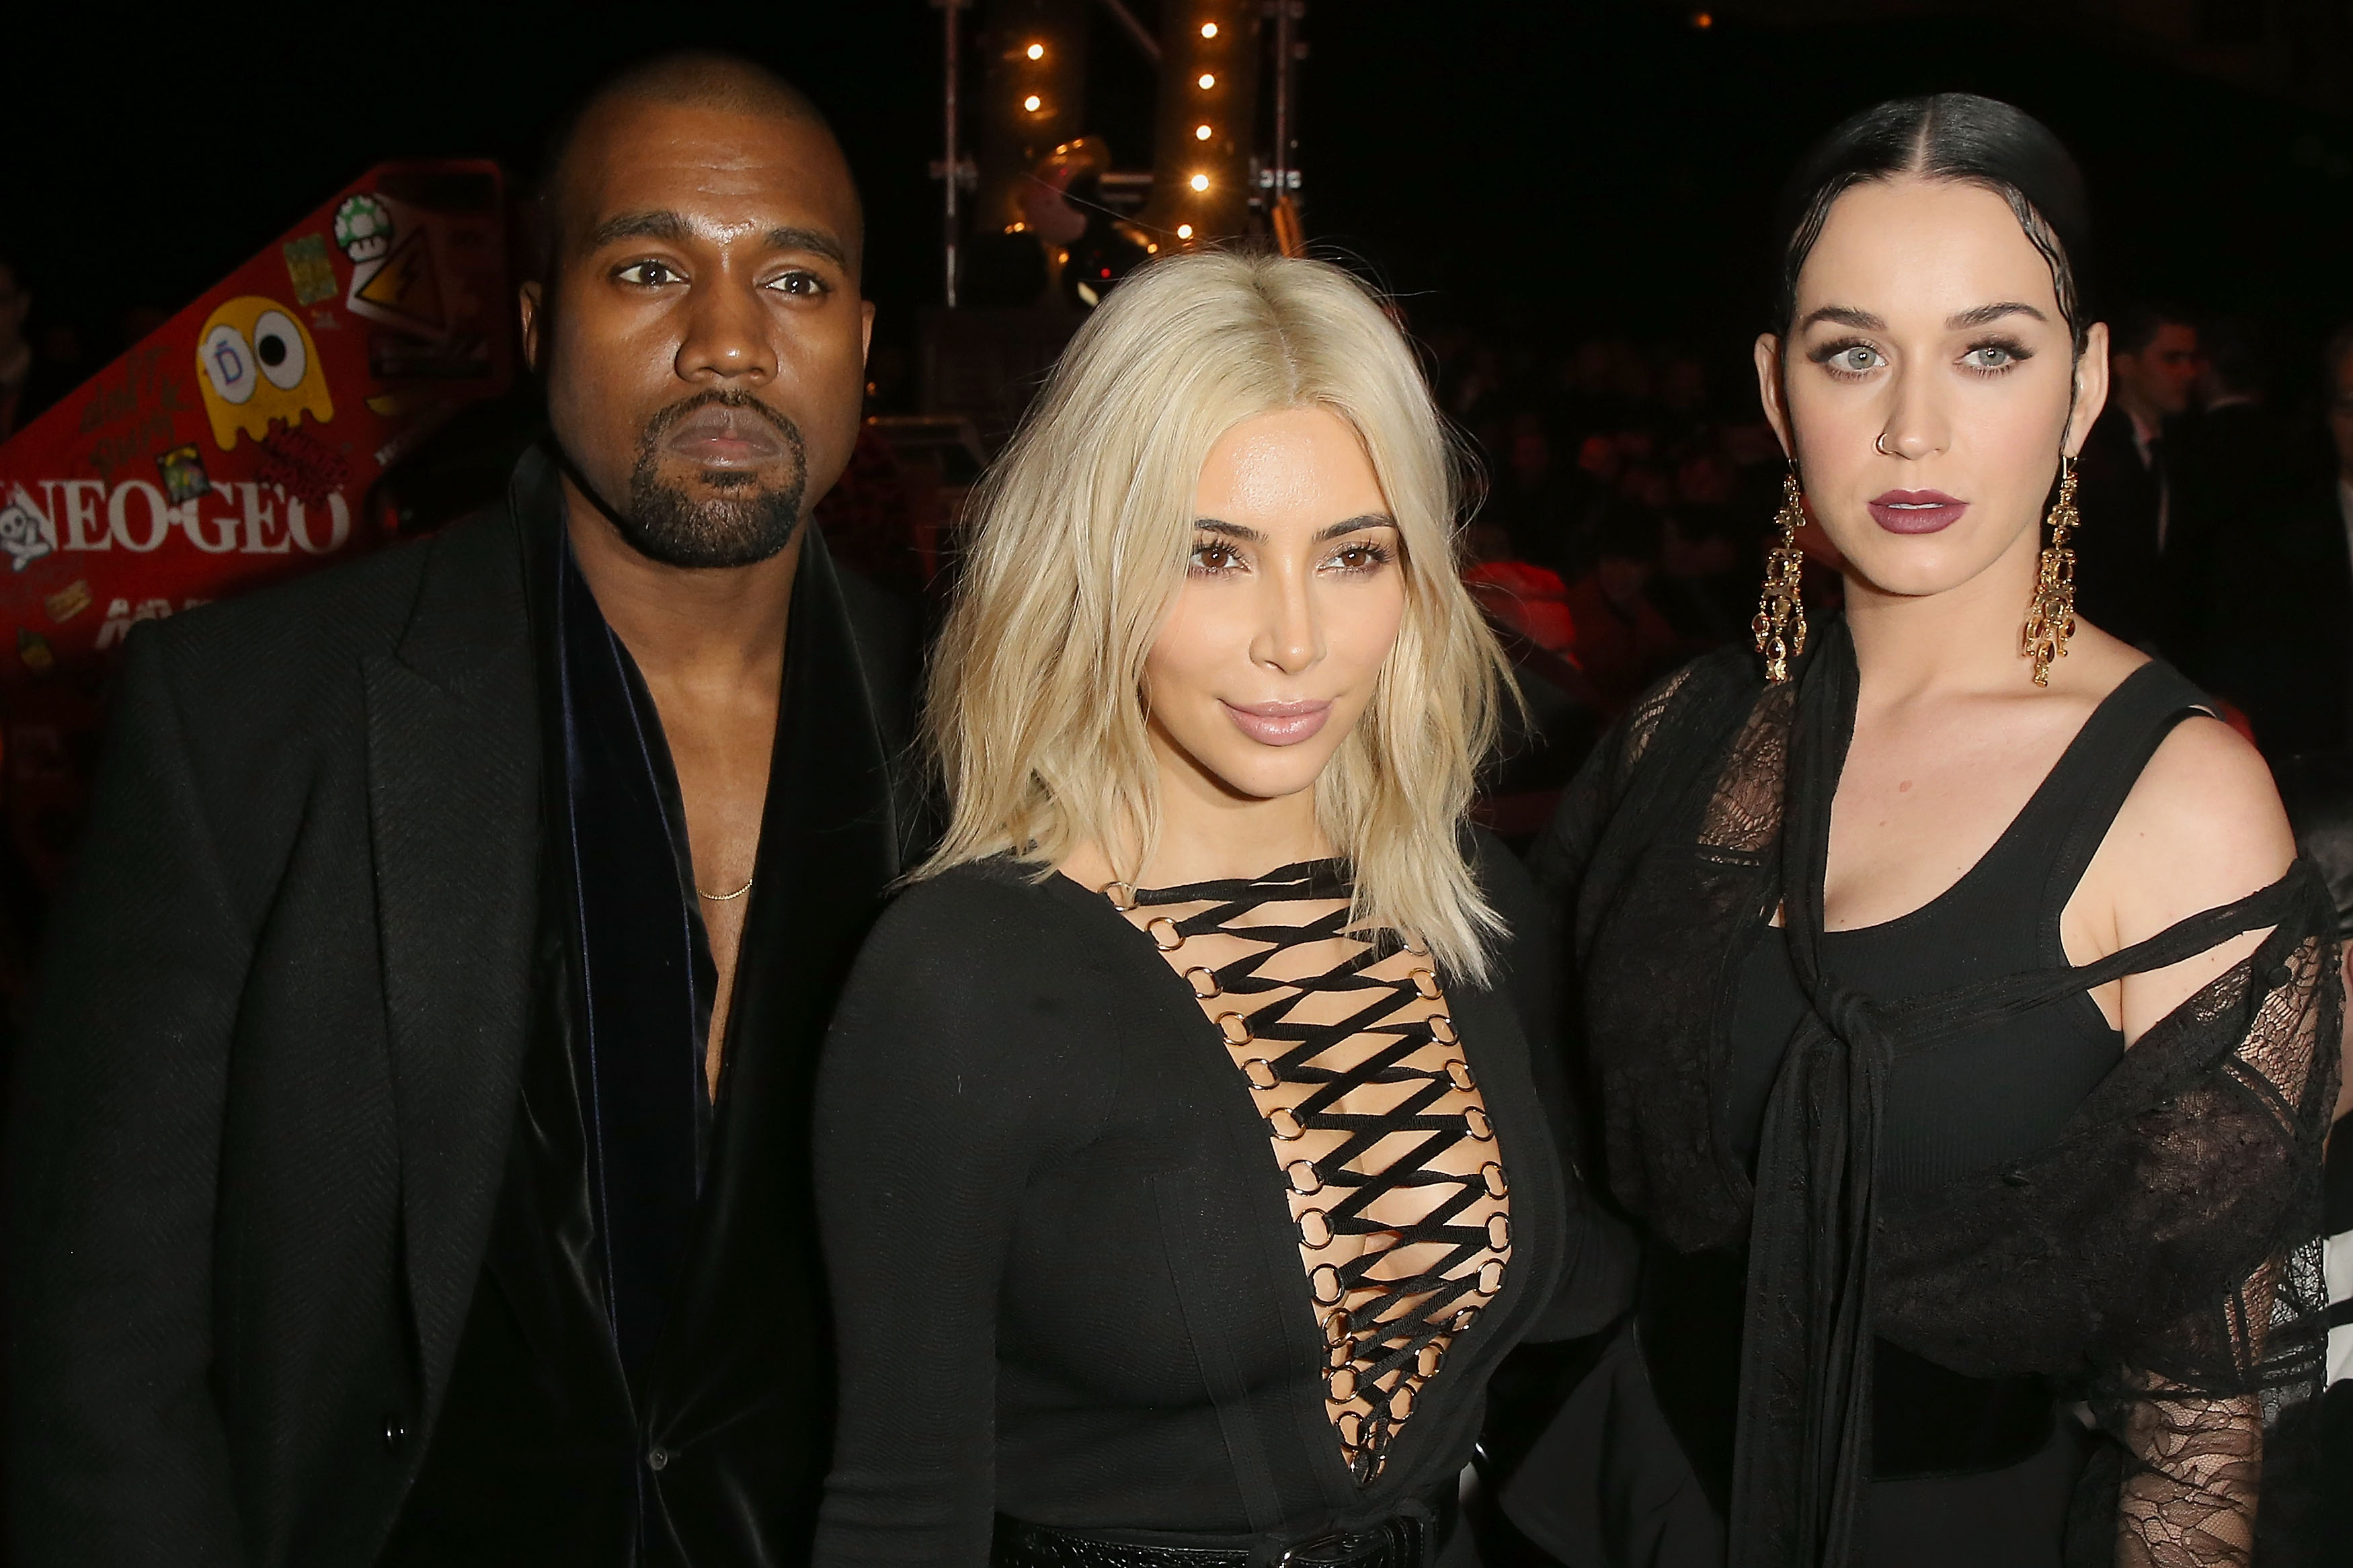 Kanye West, Kim Kardashian and Katy Perry at the Givenchy Fall/Winter 2015 fashion show.